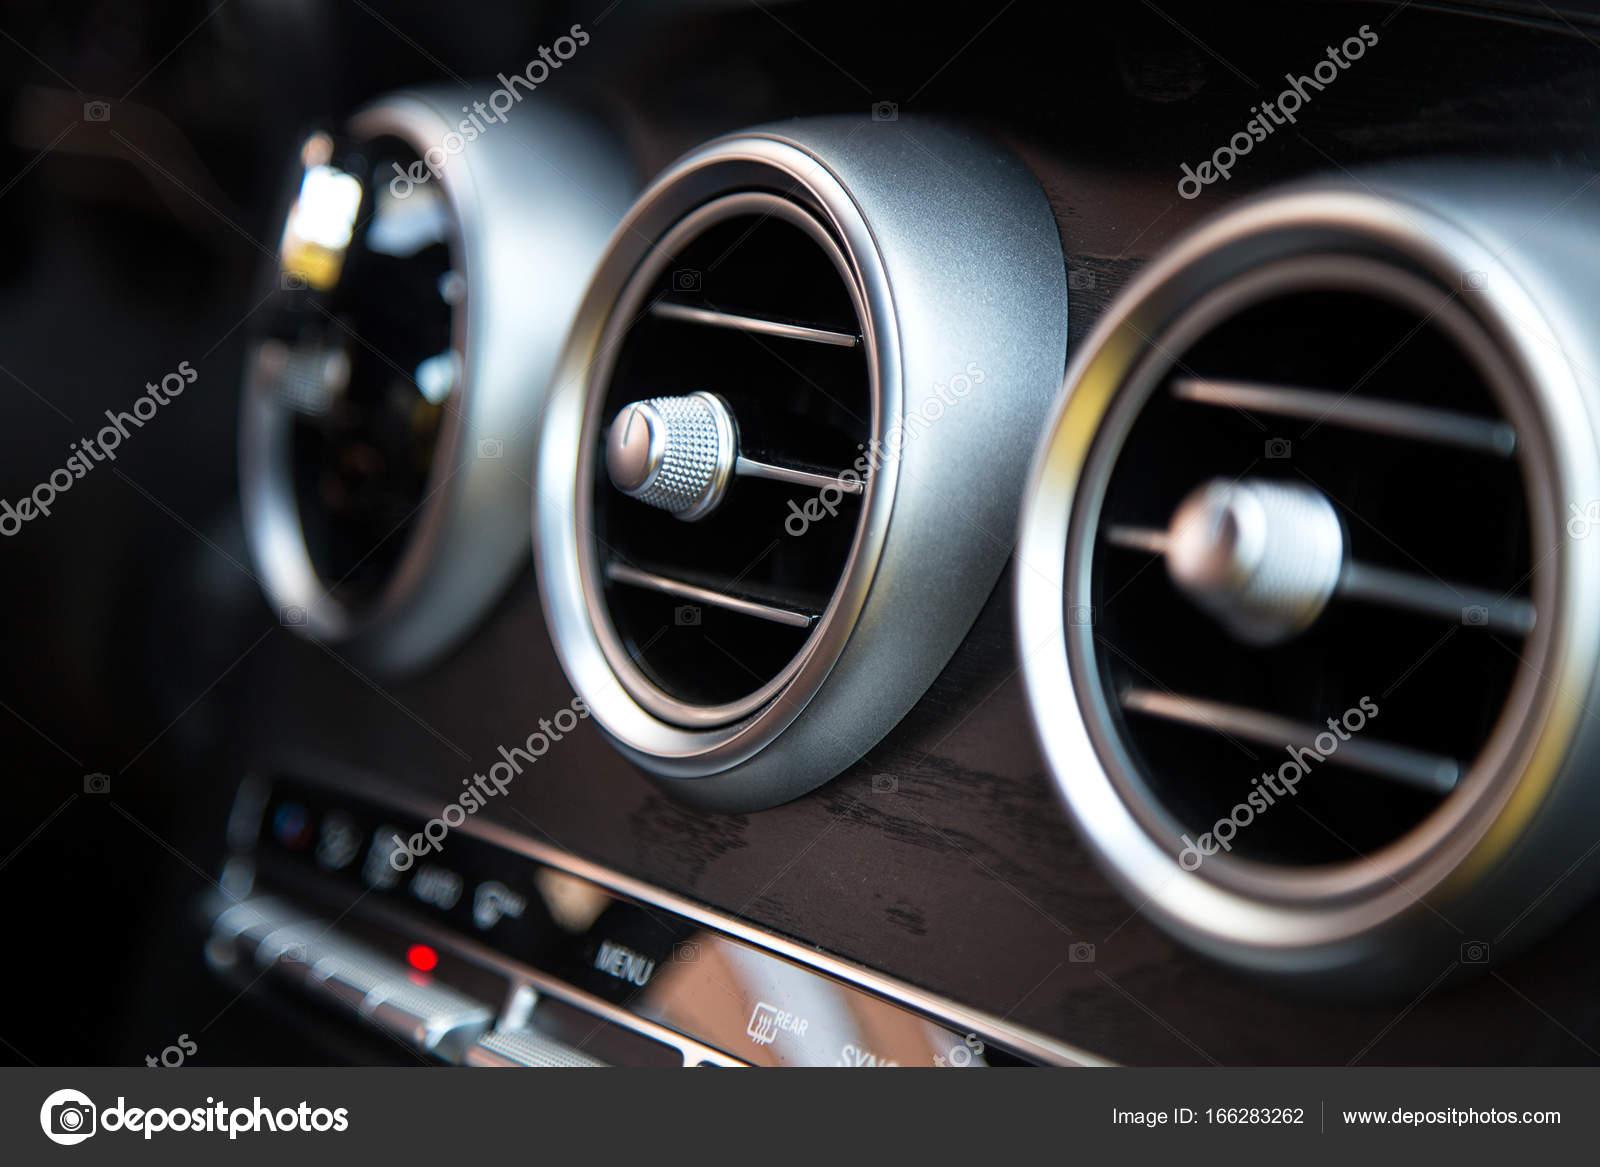 Otomobilde klima kontrolü